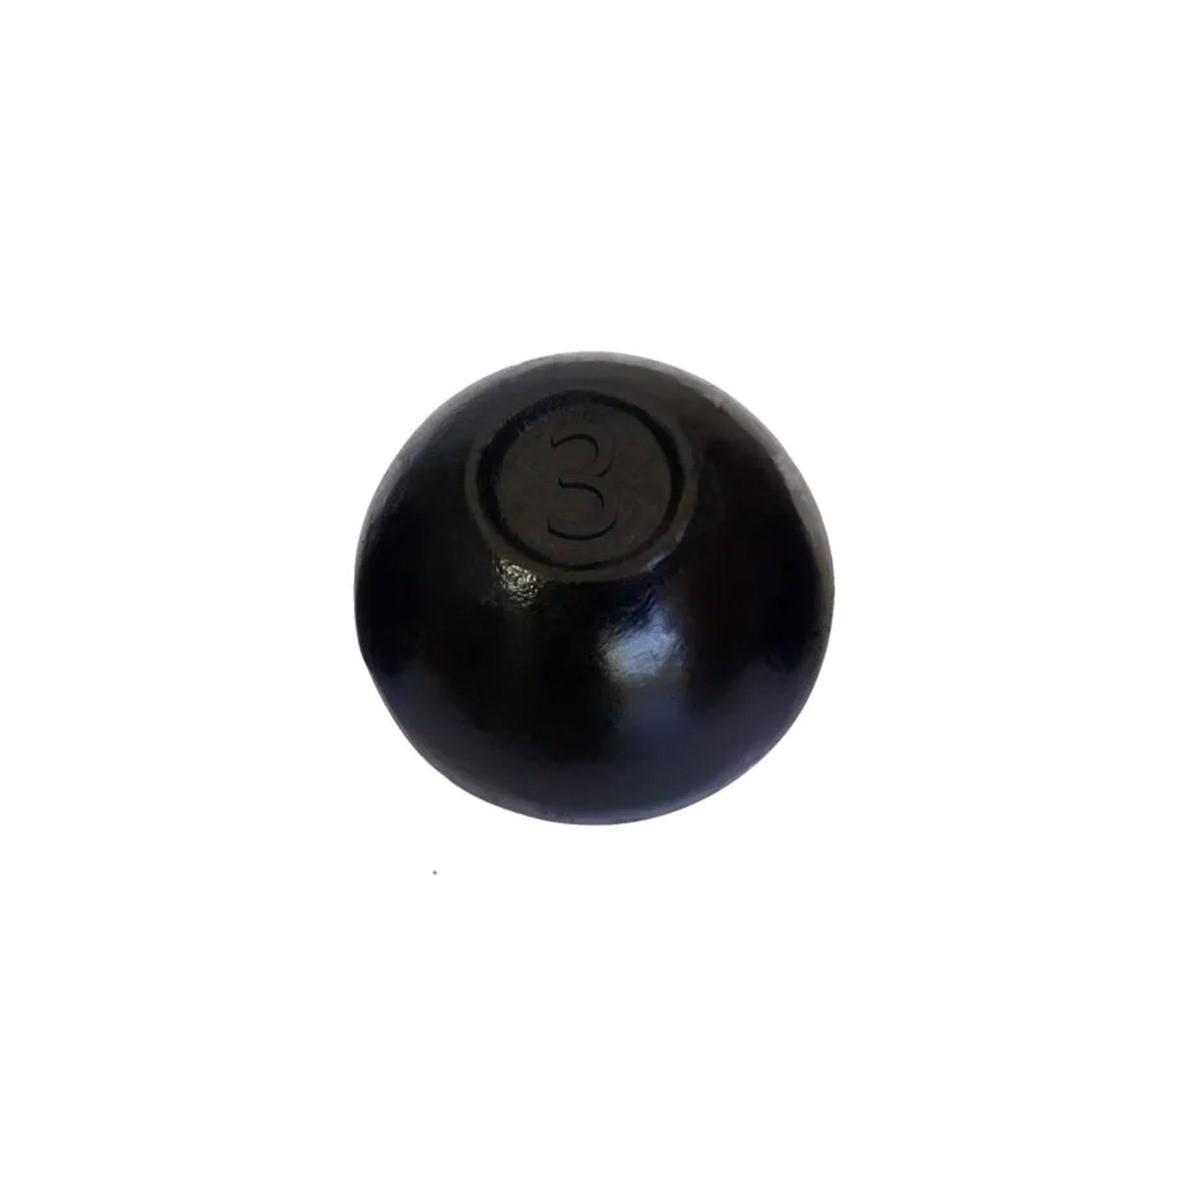 Bola de Arremesso Ferro Fundido Treinamento Funcional 3Kg  - Panela de Ferro Fundido